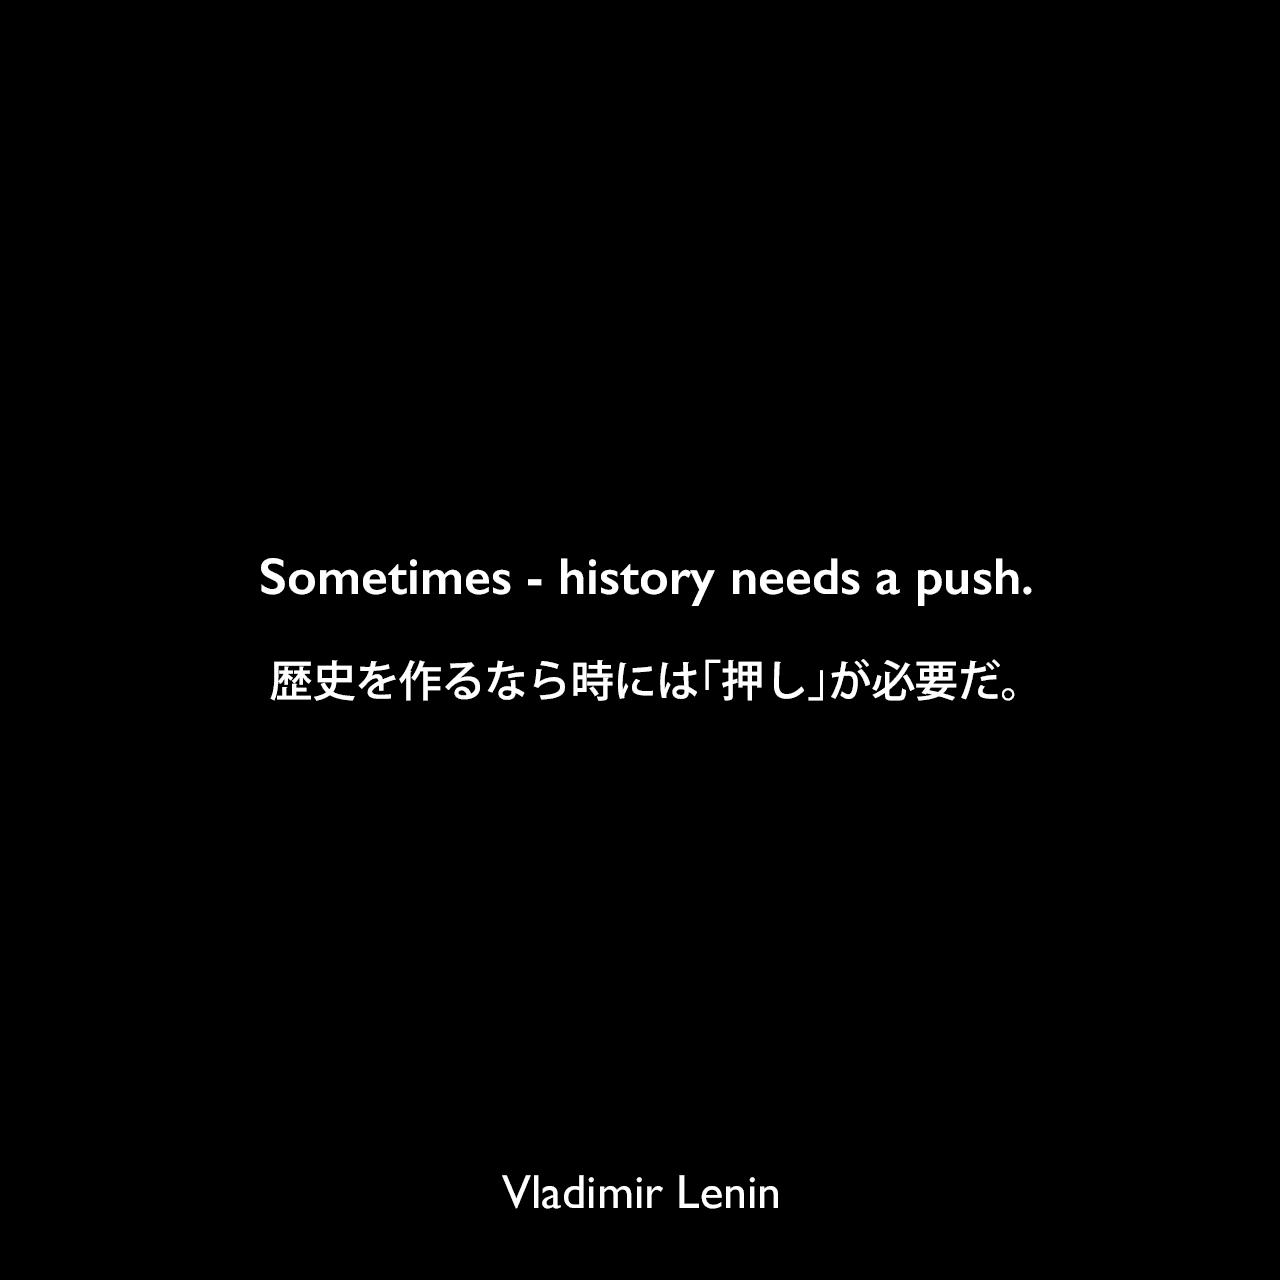 Sometimes - history needs a push.歴史を作るなら時には「押し」が必要だ。Vladimir Lenin